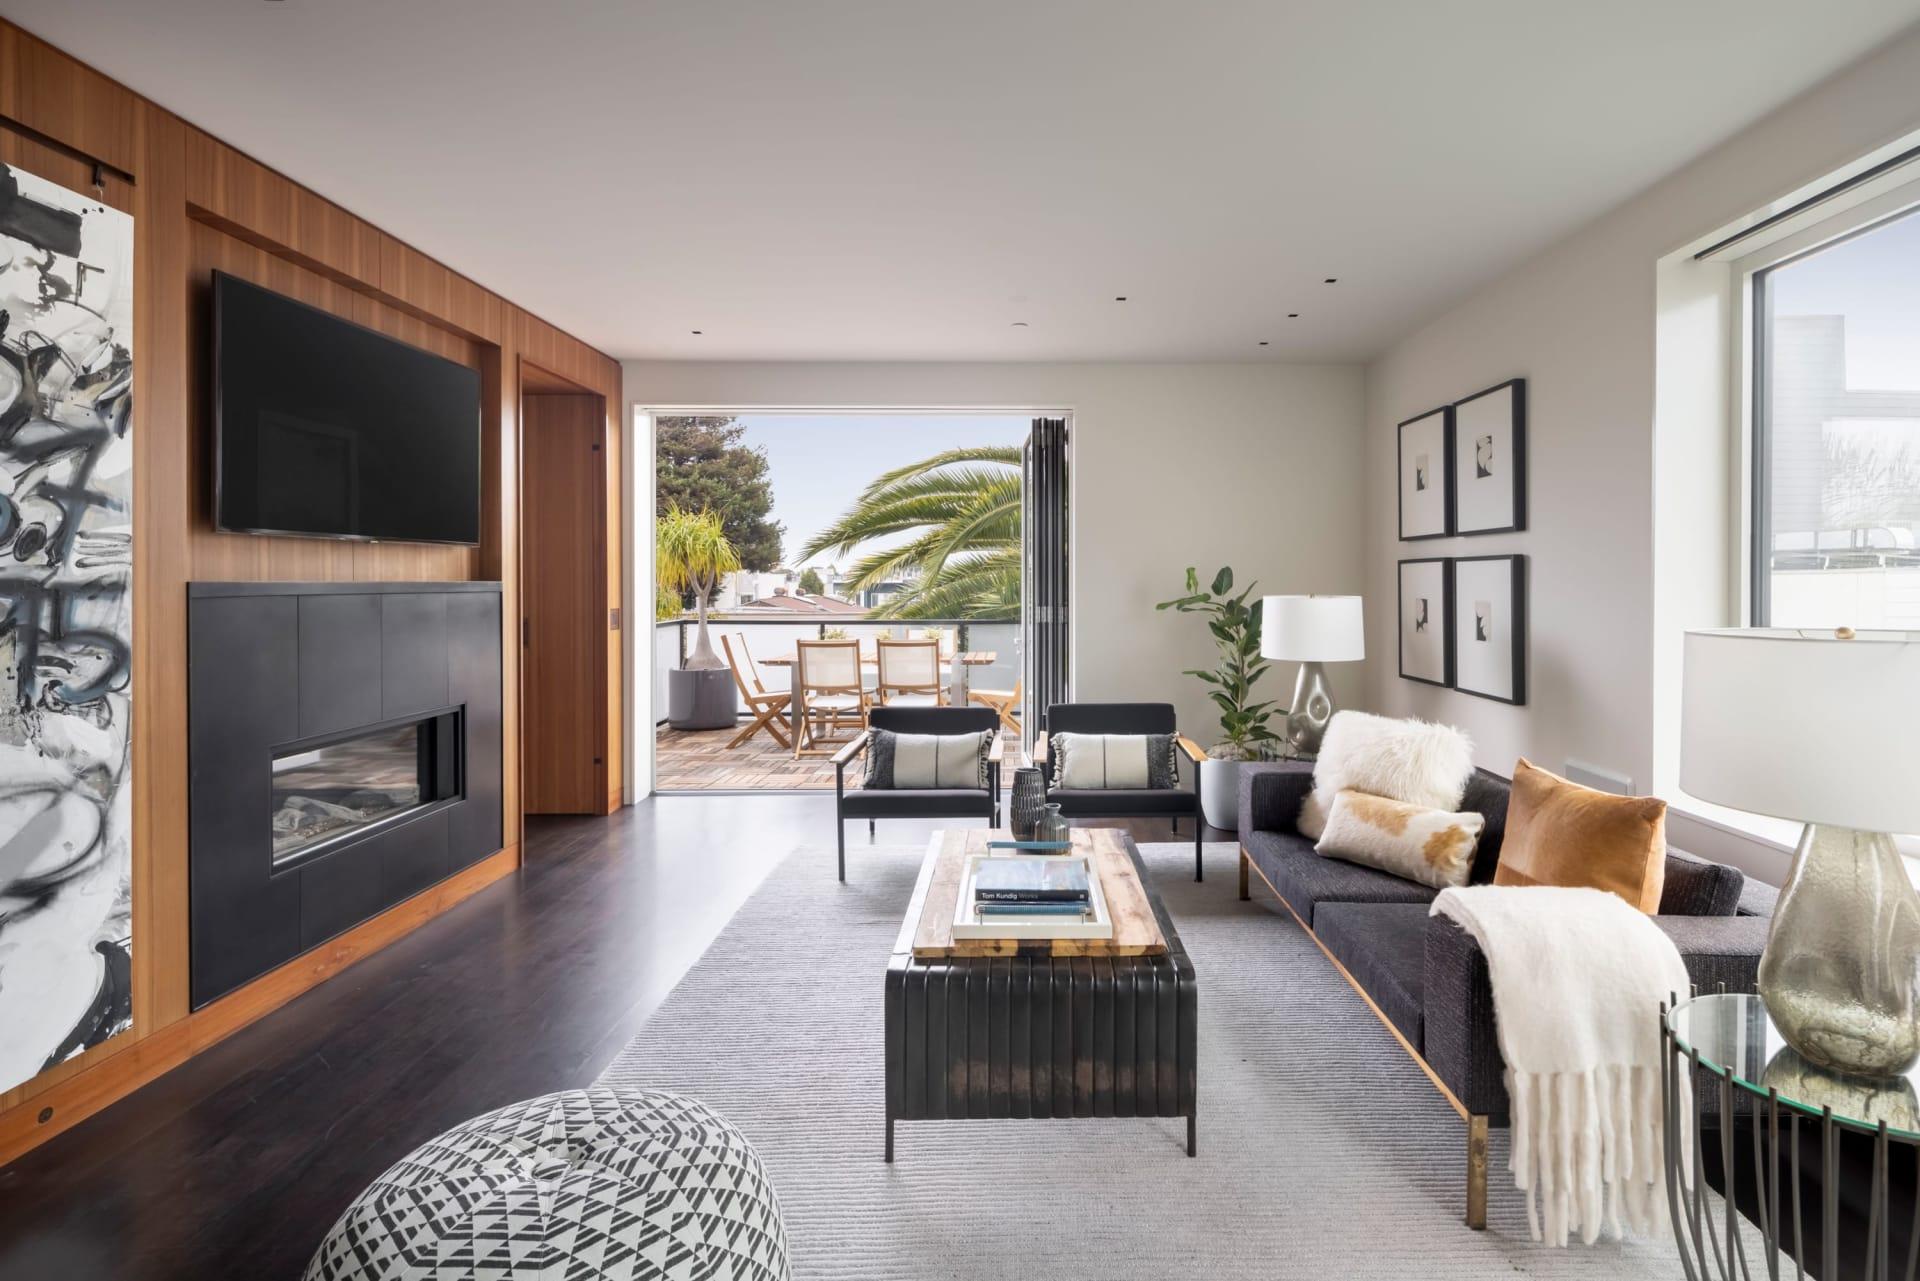 Designer-Renovated Penthouse | $2,995,000